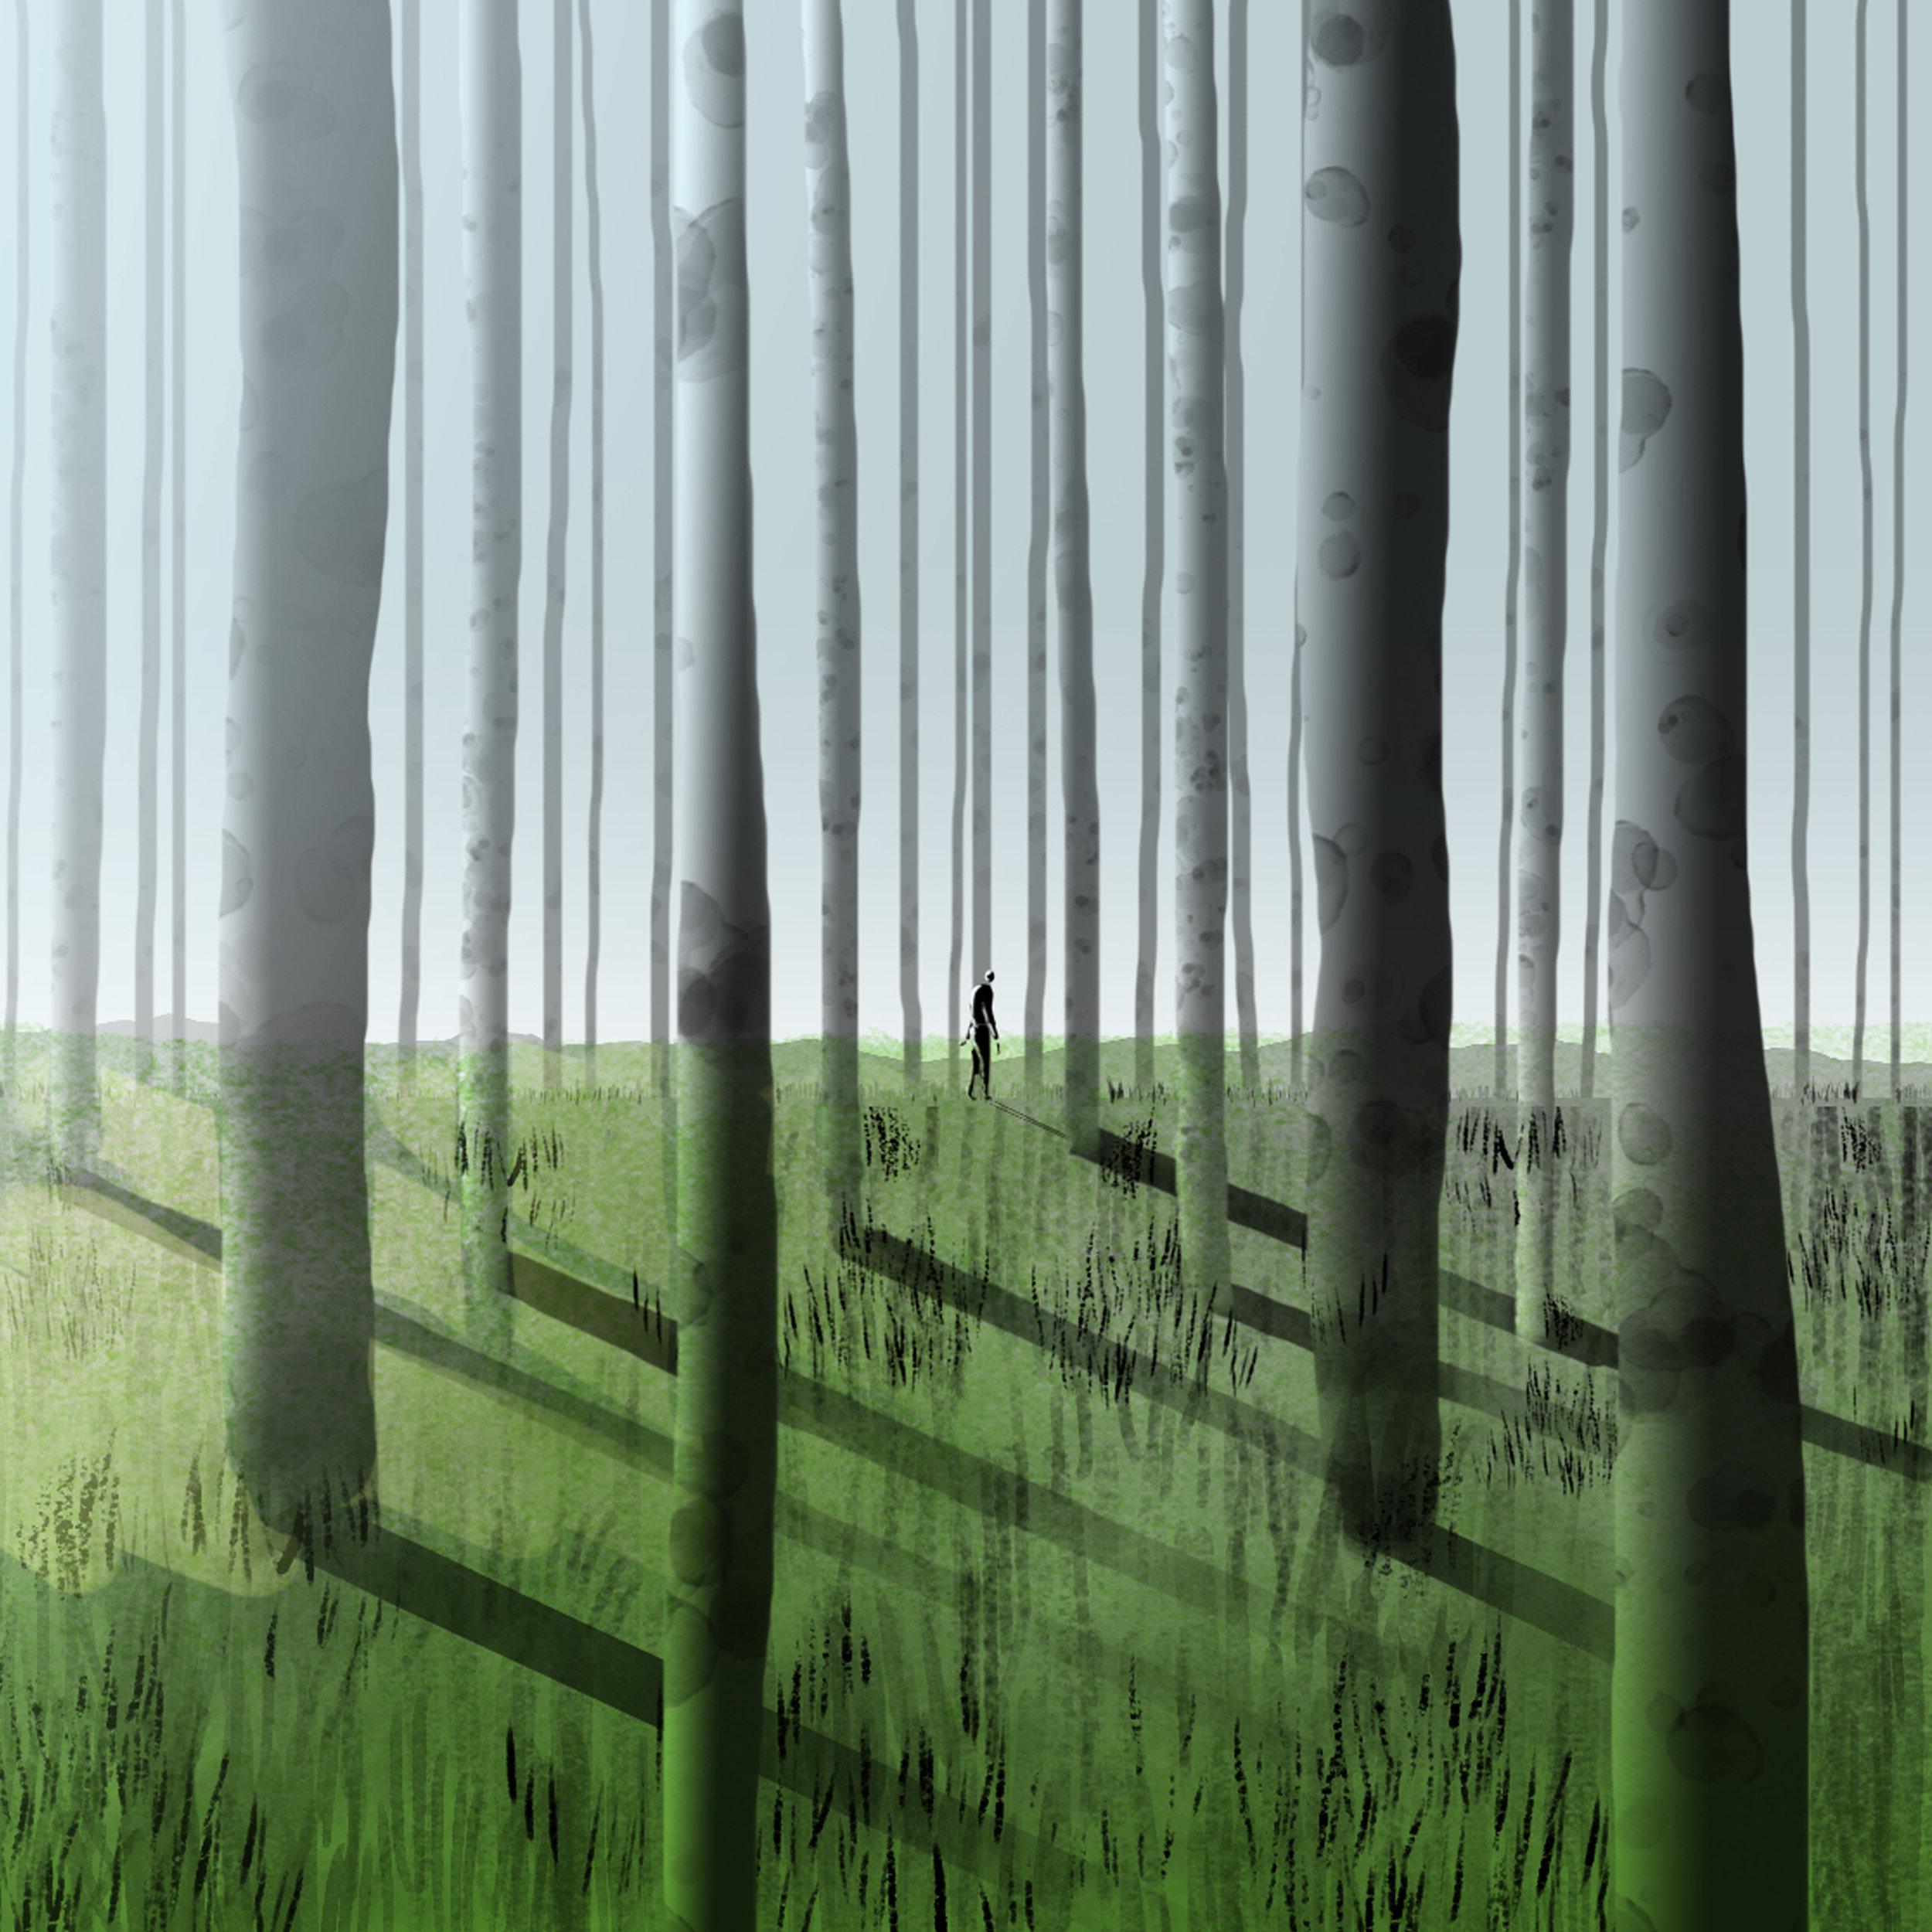 Forest_02Noon.jpg